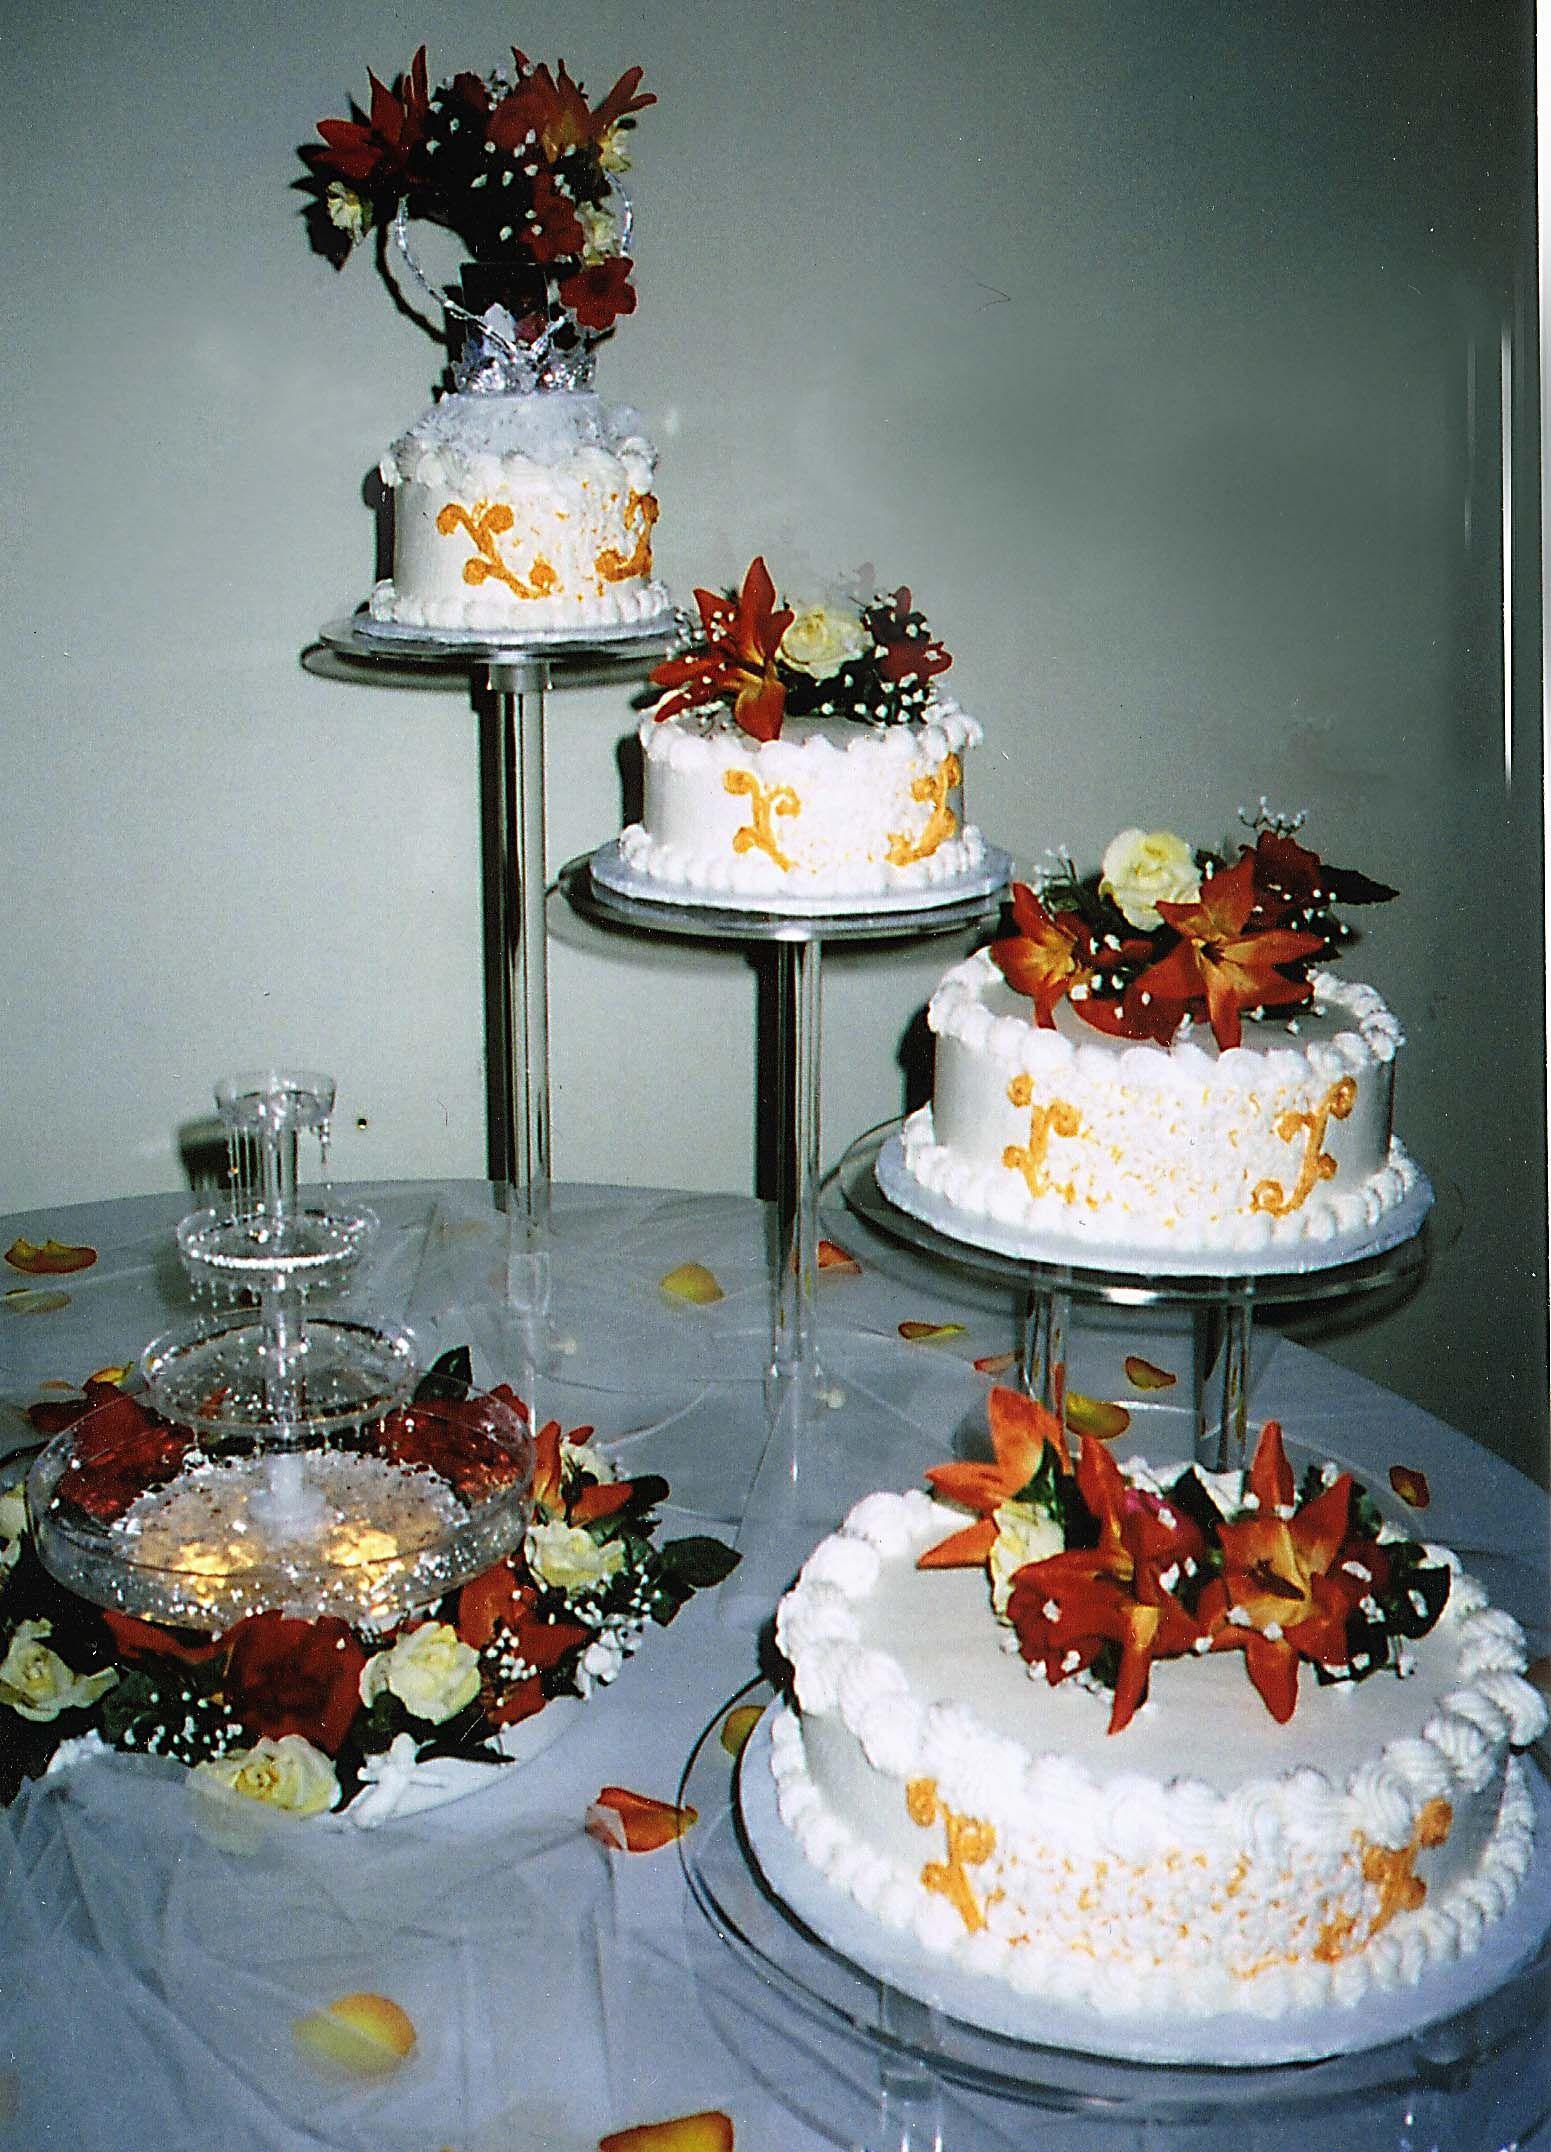 Four Tier Round Fall Wedding Cake. D & D Cake Designs/Jacksonville, Florida